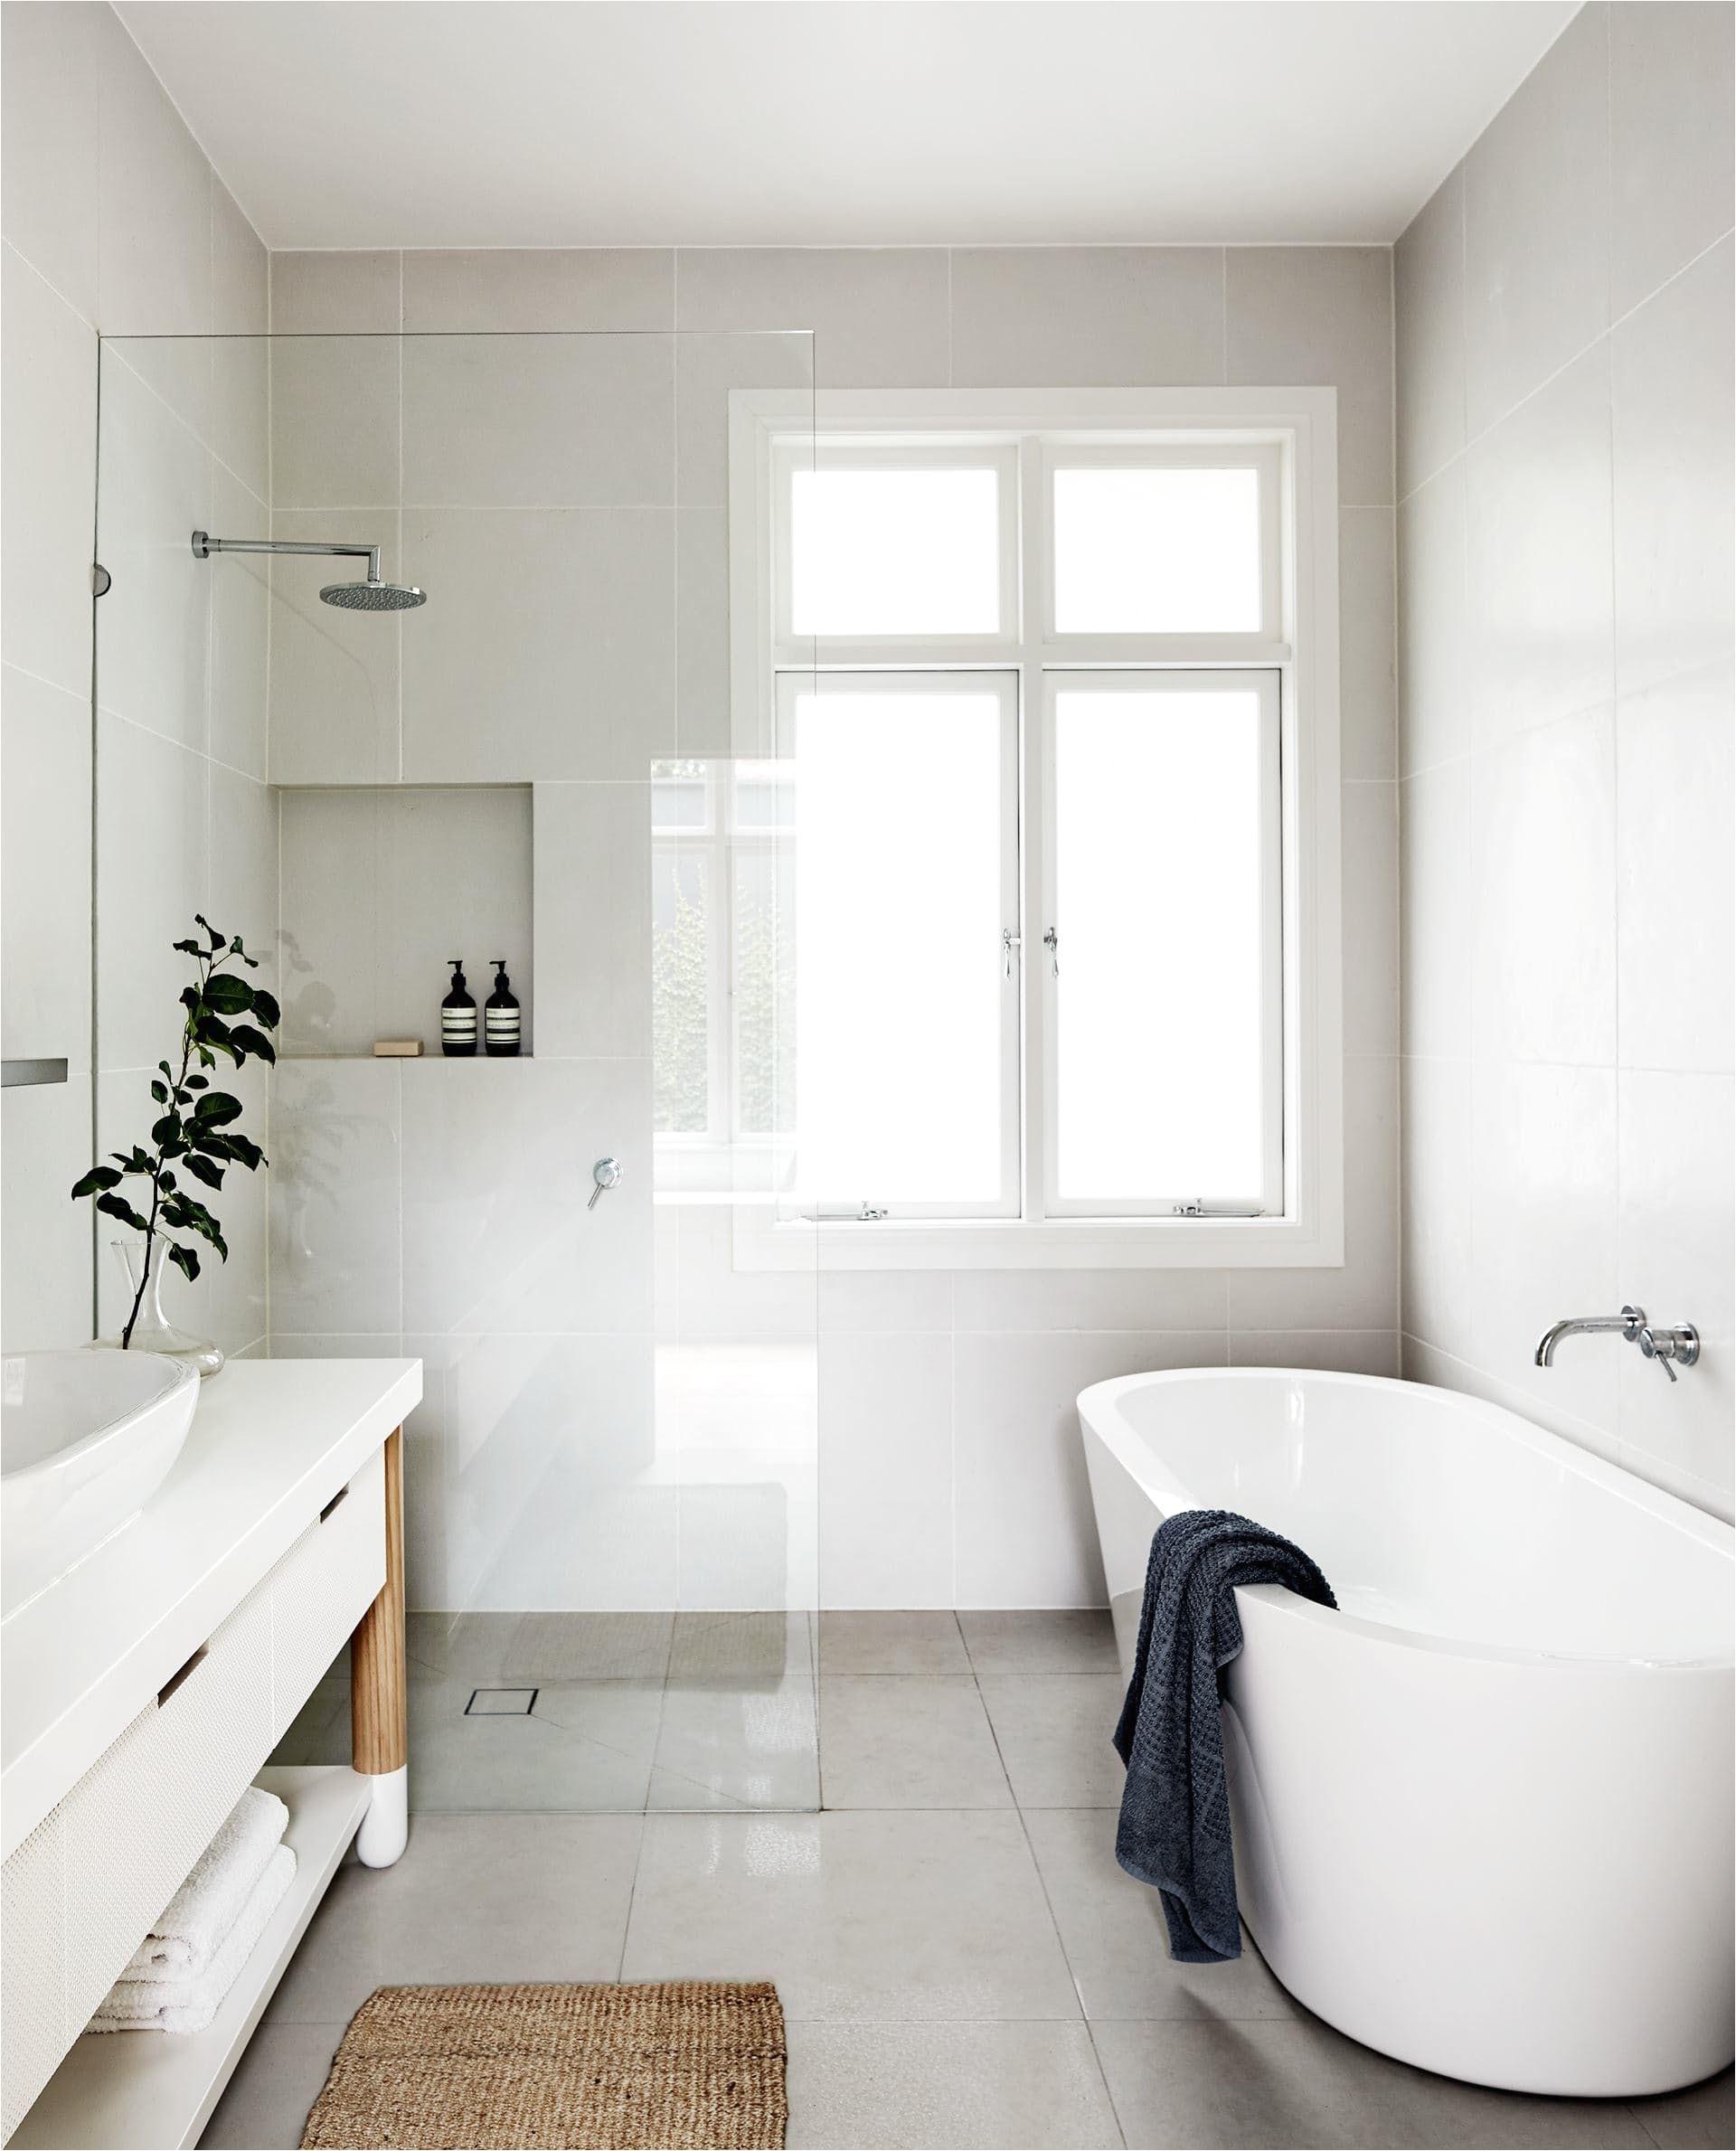 Australian Bathroom Design Ideas Stylish Remodeling Ideas For Small  Bathrooms In 2018